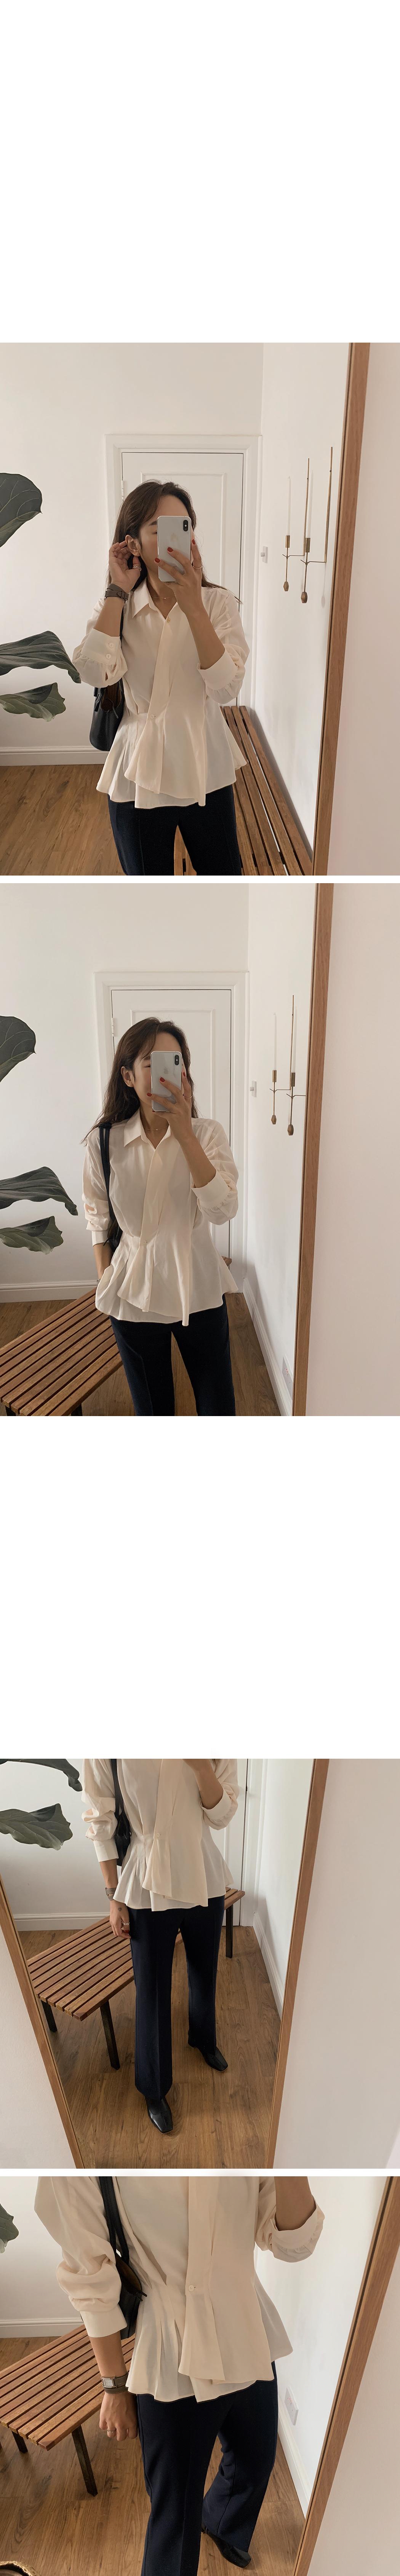 Fail rap blouse